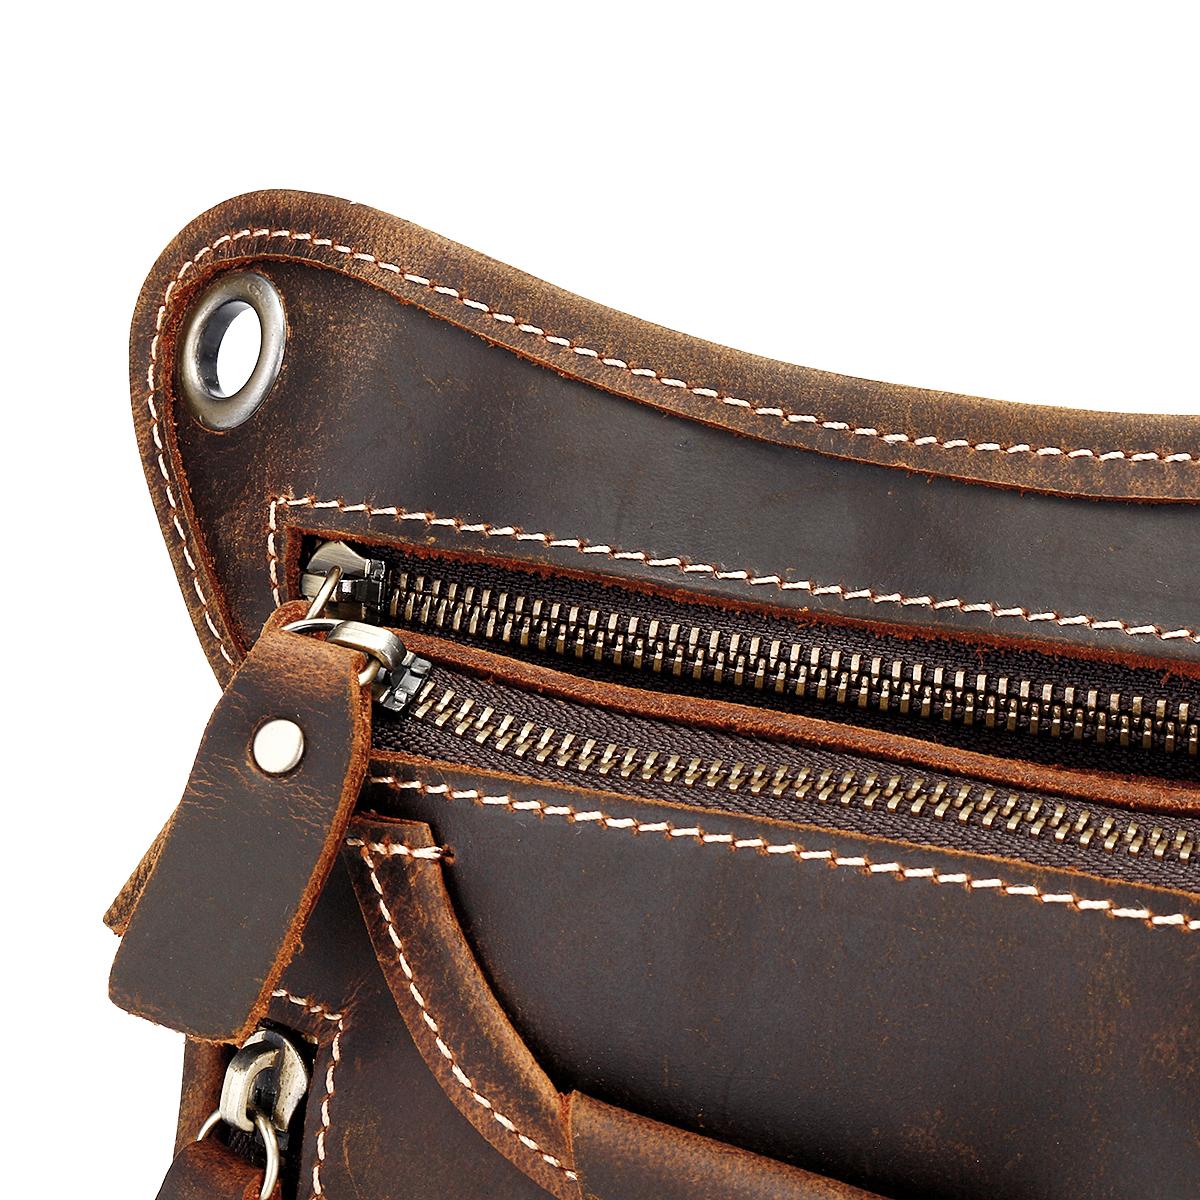 Men Vintage Leather Motorcycle Rider Waist Hip Bum Fanny Pack Drop Leg Bag Crossbody Pouch 34